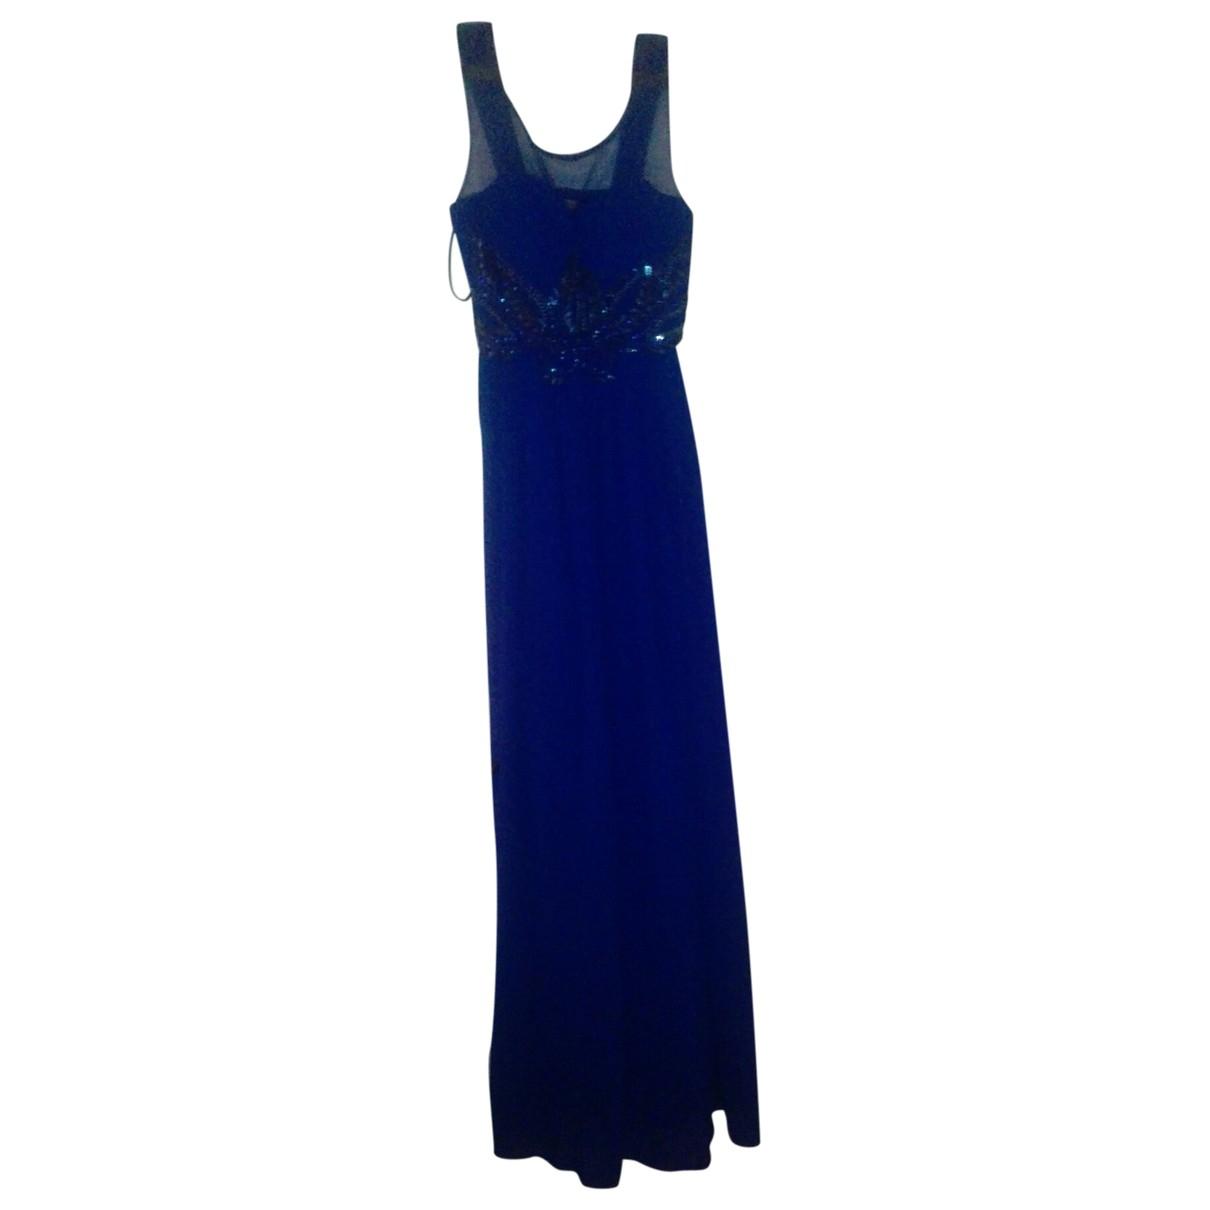 Autre Marque \N Kleid in  Blau Synthetik